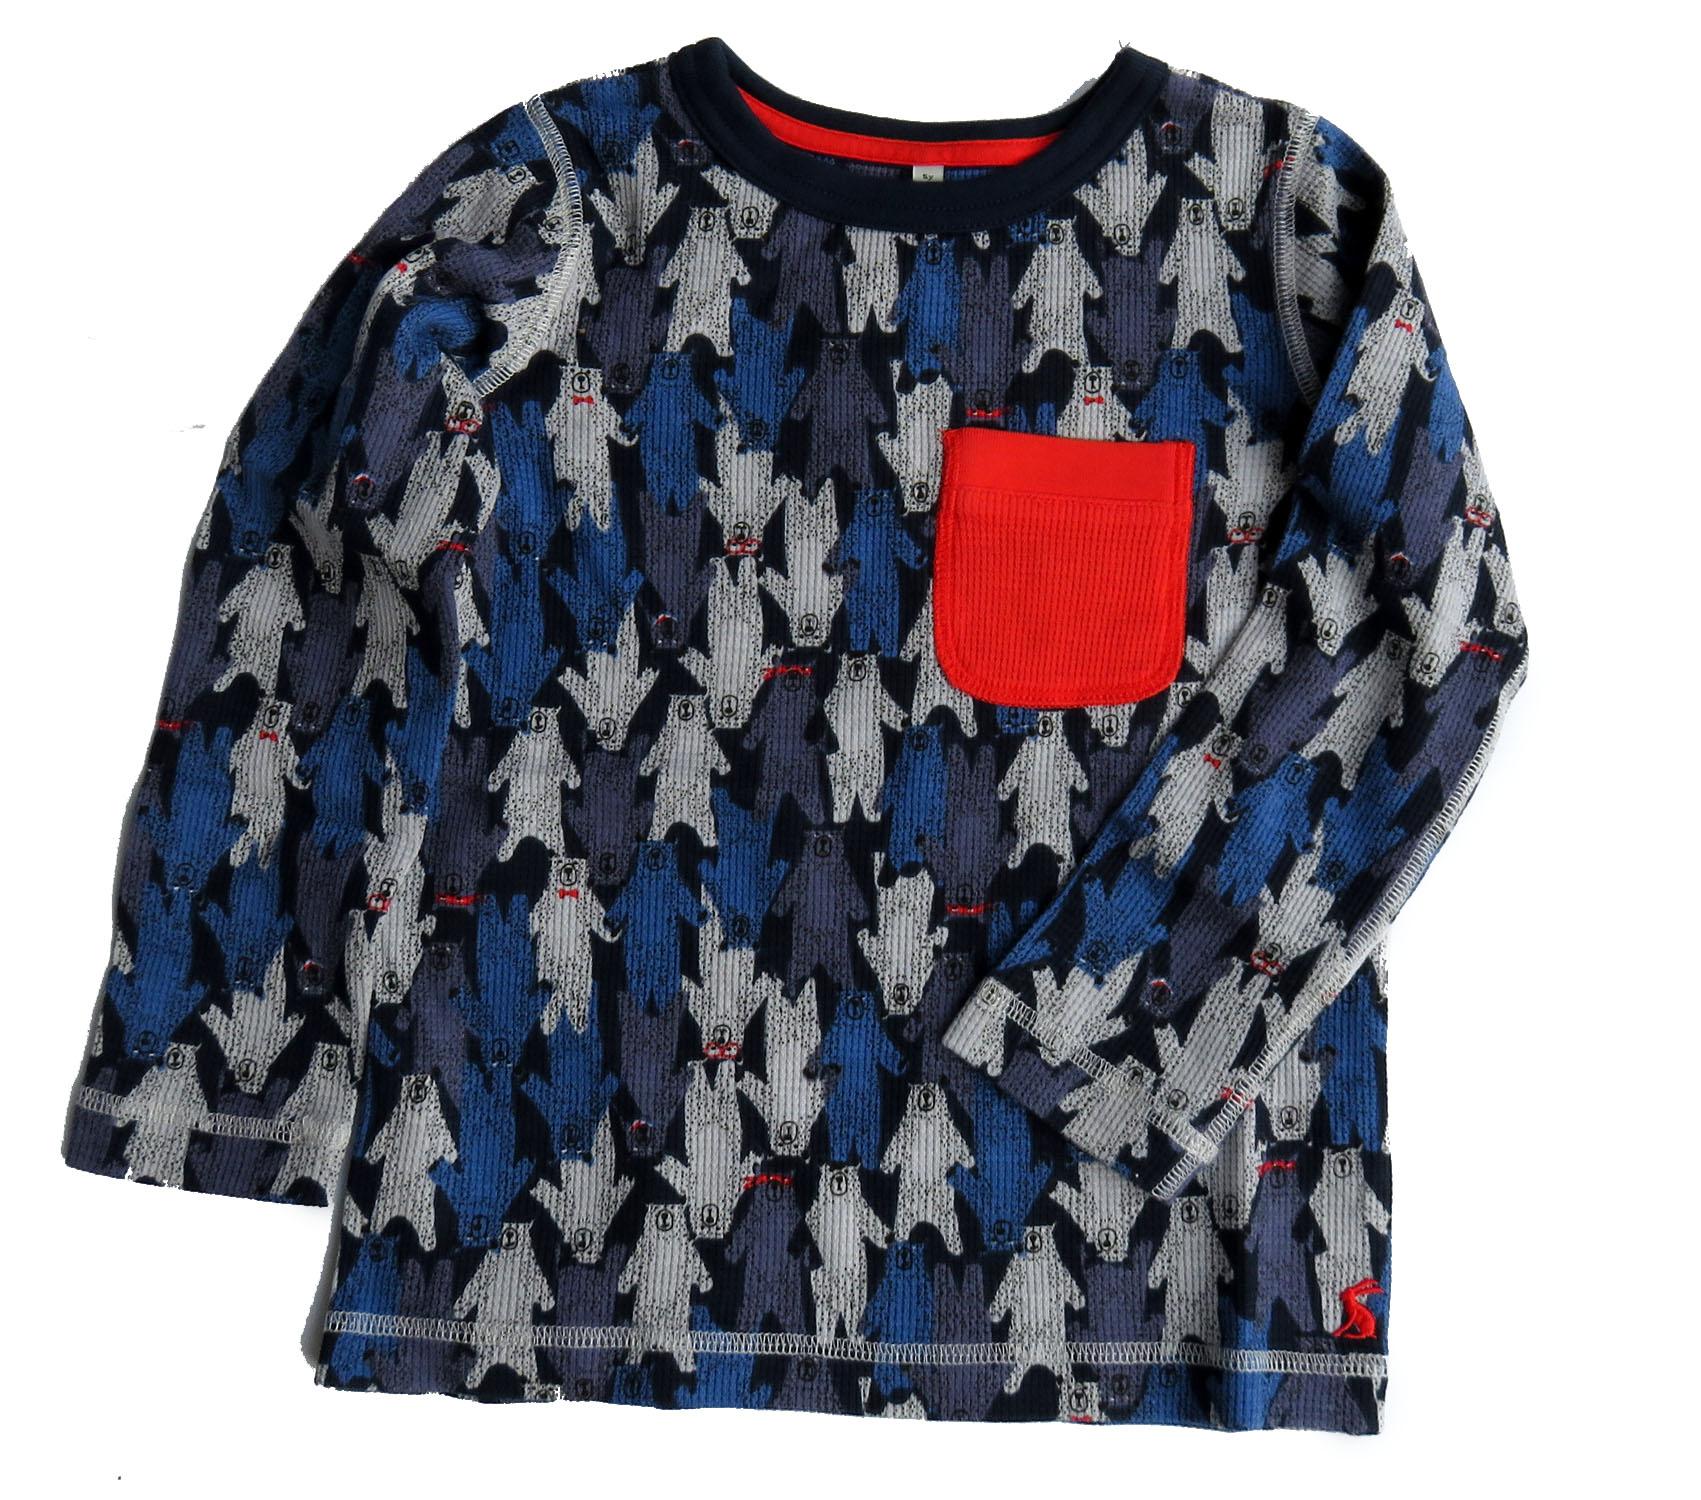 TOM JOULE Longsleeve T-Shirt grau mit Rucksack Print Applikation 98 104 110 116